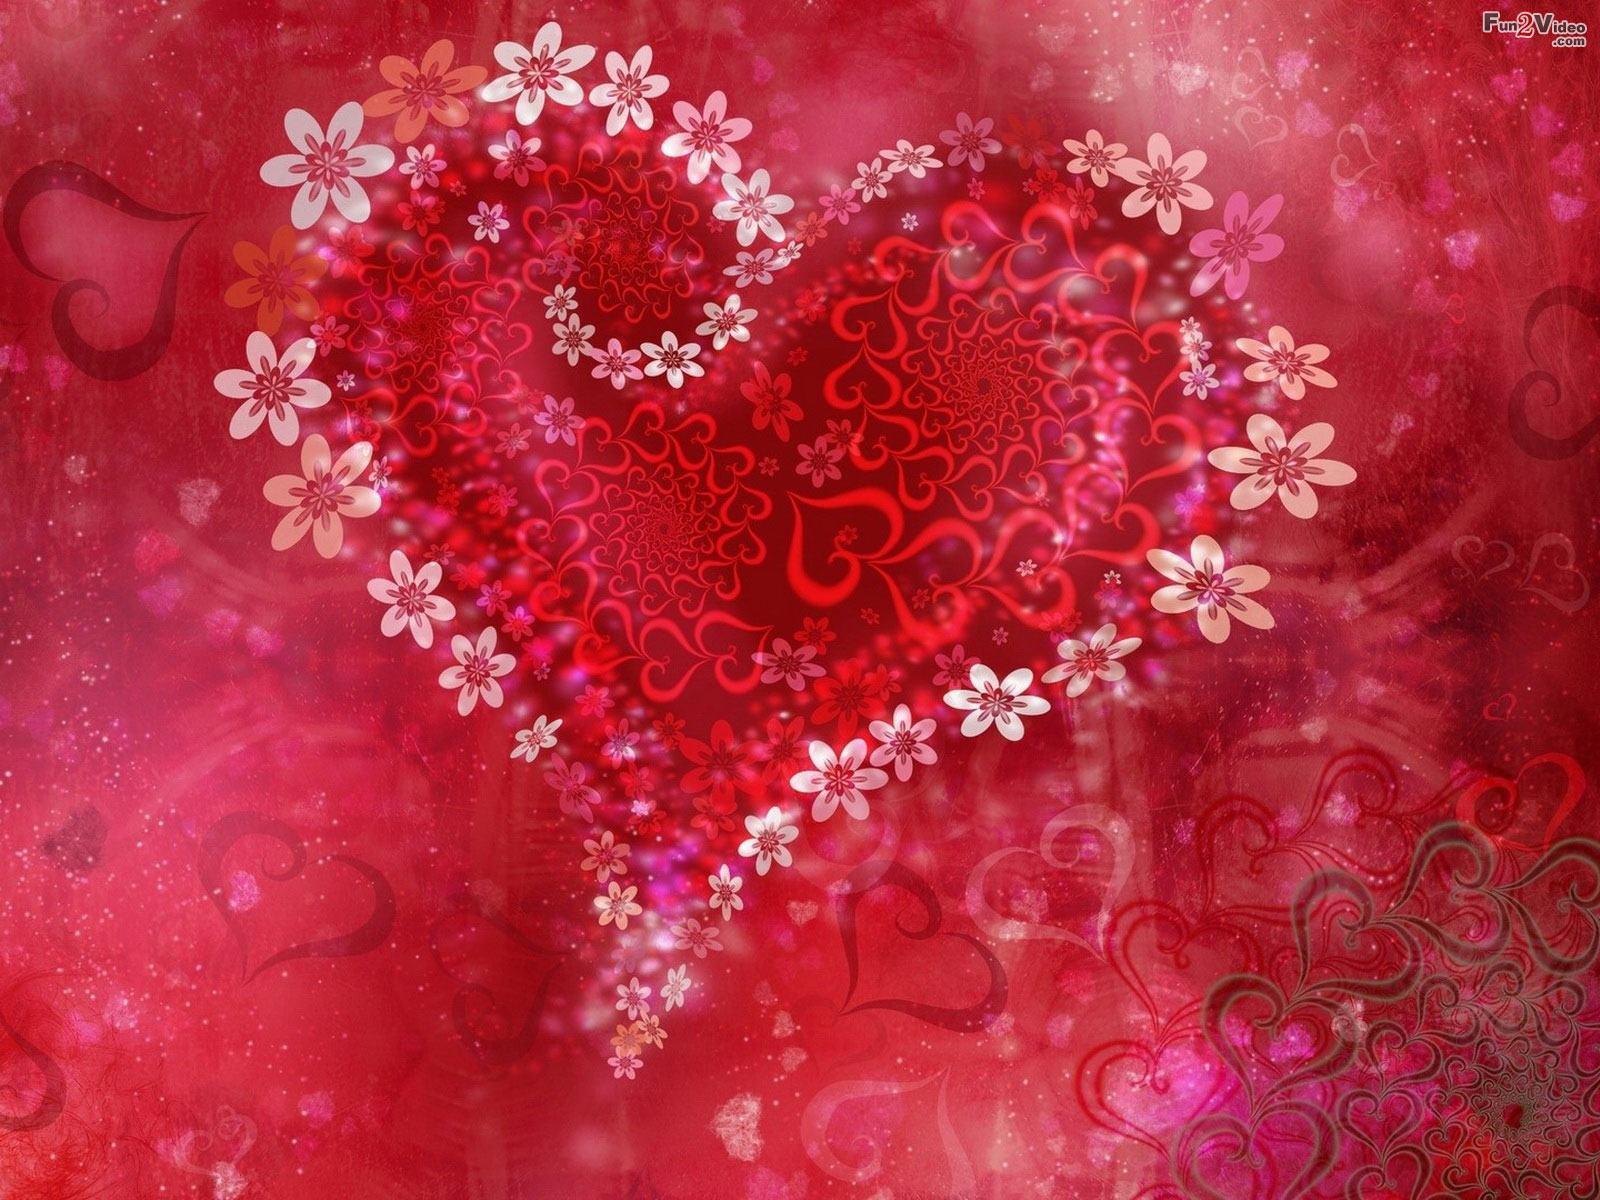 Free Valentine Desktop Wallpaper - WallpaperSafari